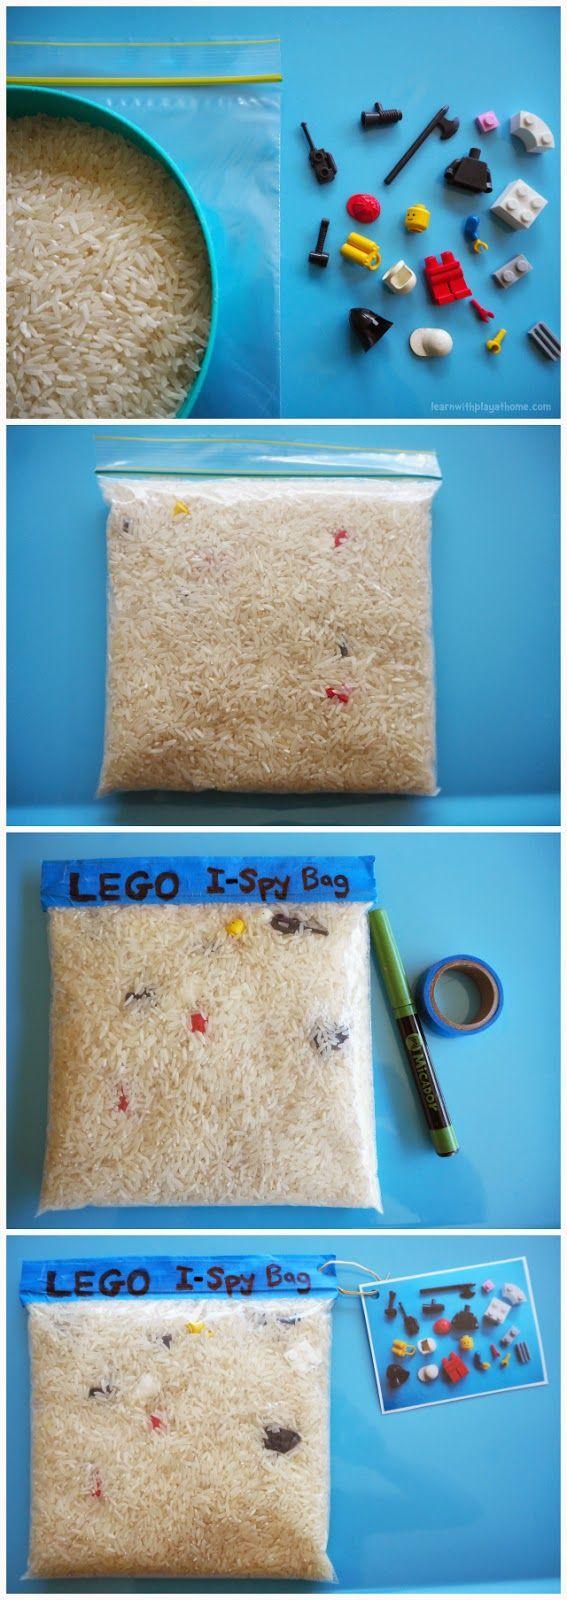 DIY LEGO I-Spy Bag plus other fun road trip activities